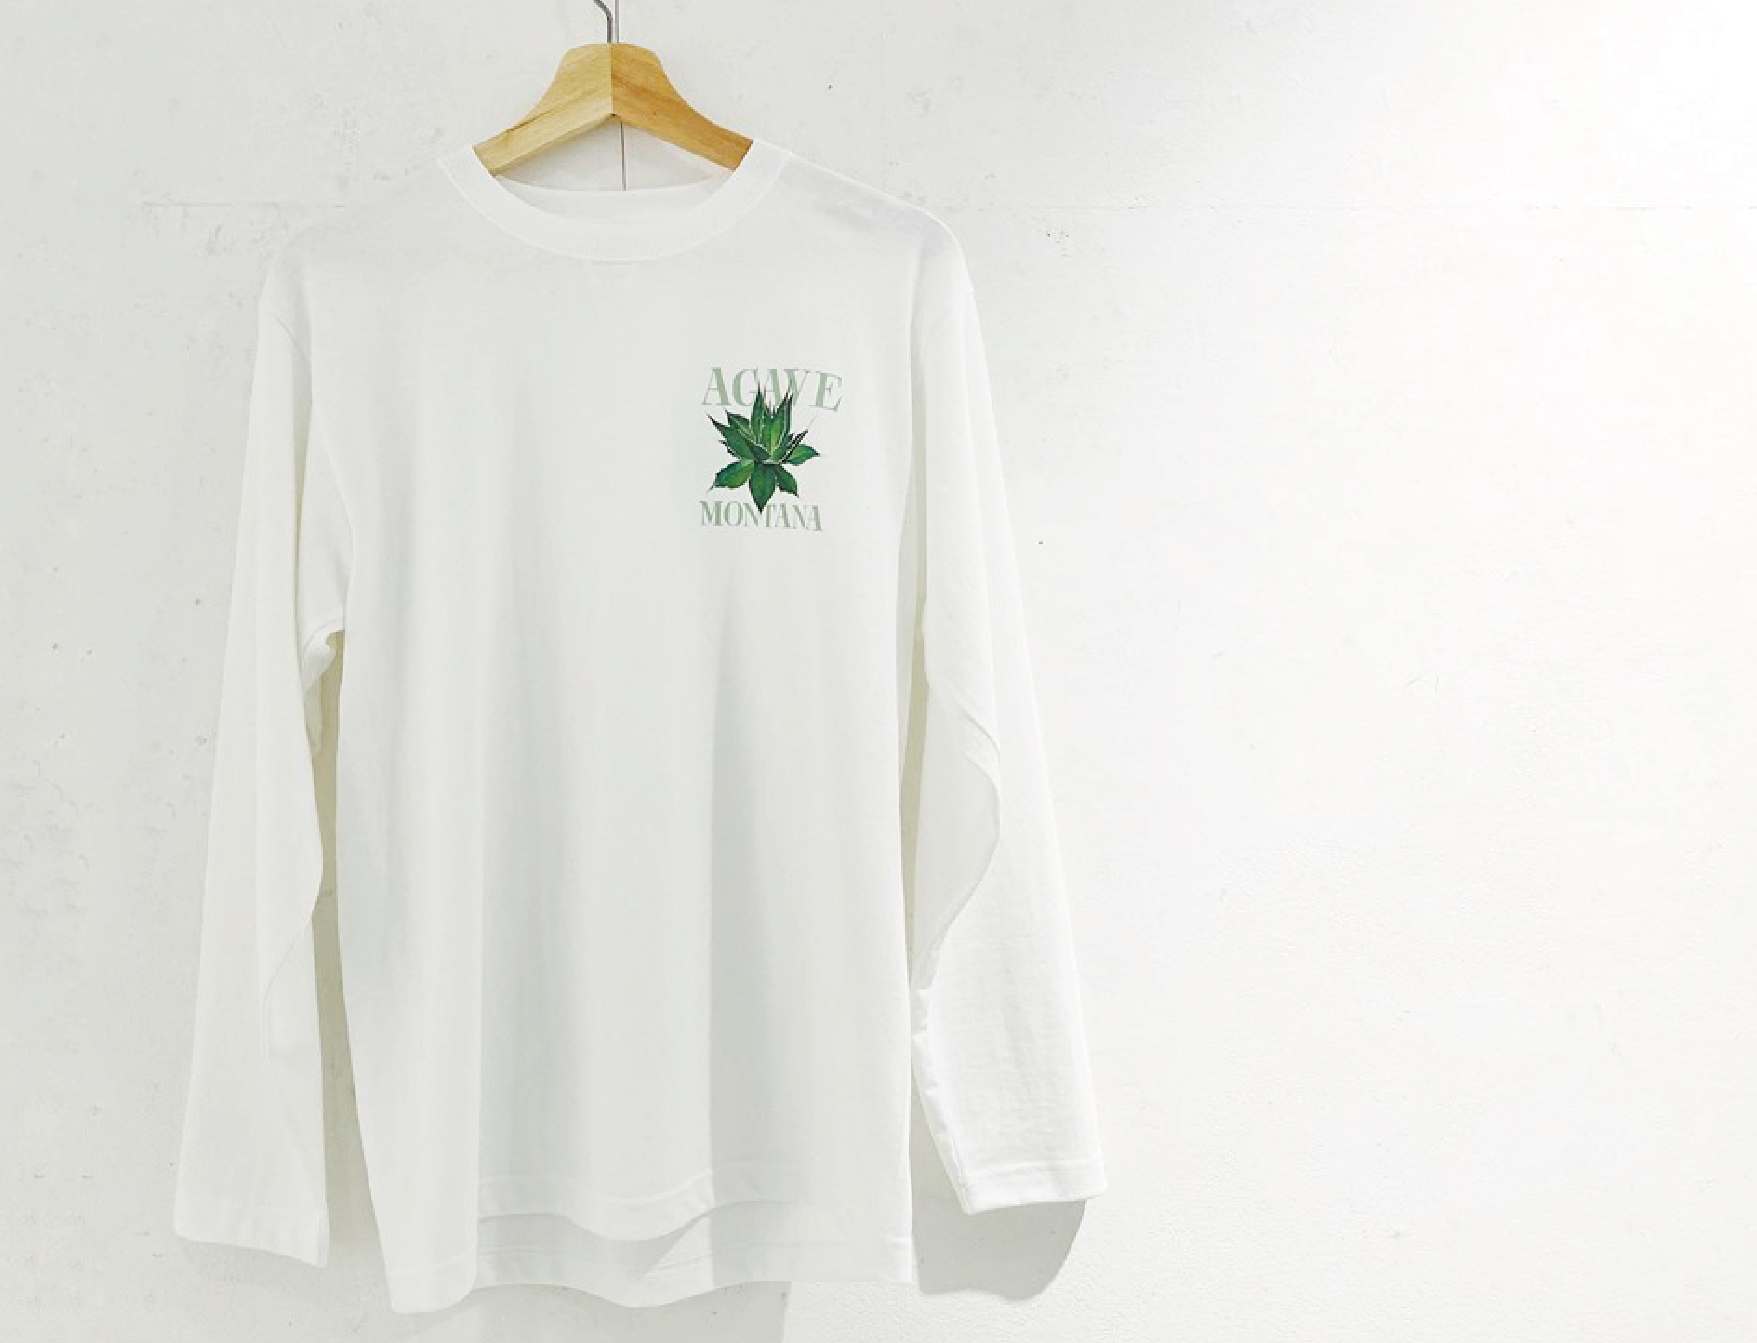 Agave Montana ロングTシャツ